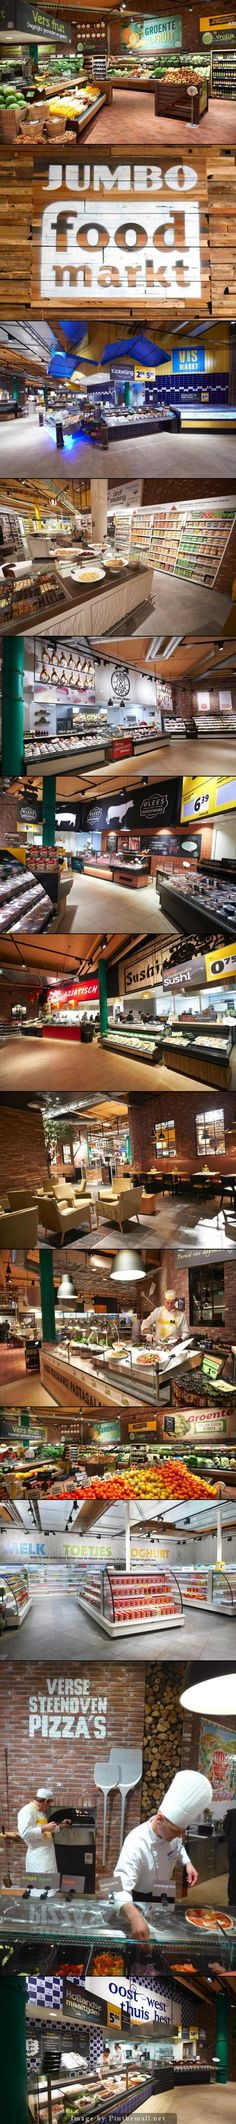 Jumbo-supermarket-flagship-VBAT-Breda-Netherlands - created on 2014-09-14 08:13:10